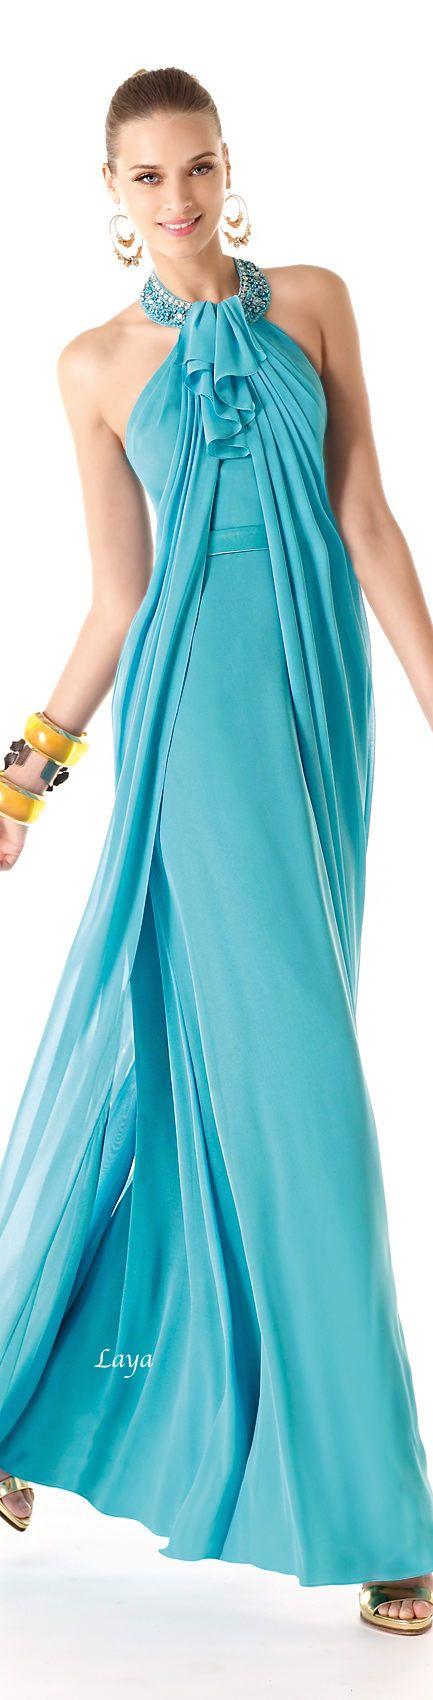 Pronovias Cocktail Dress 2014 jαɢlαdy